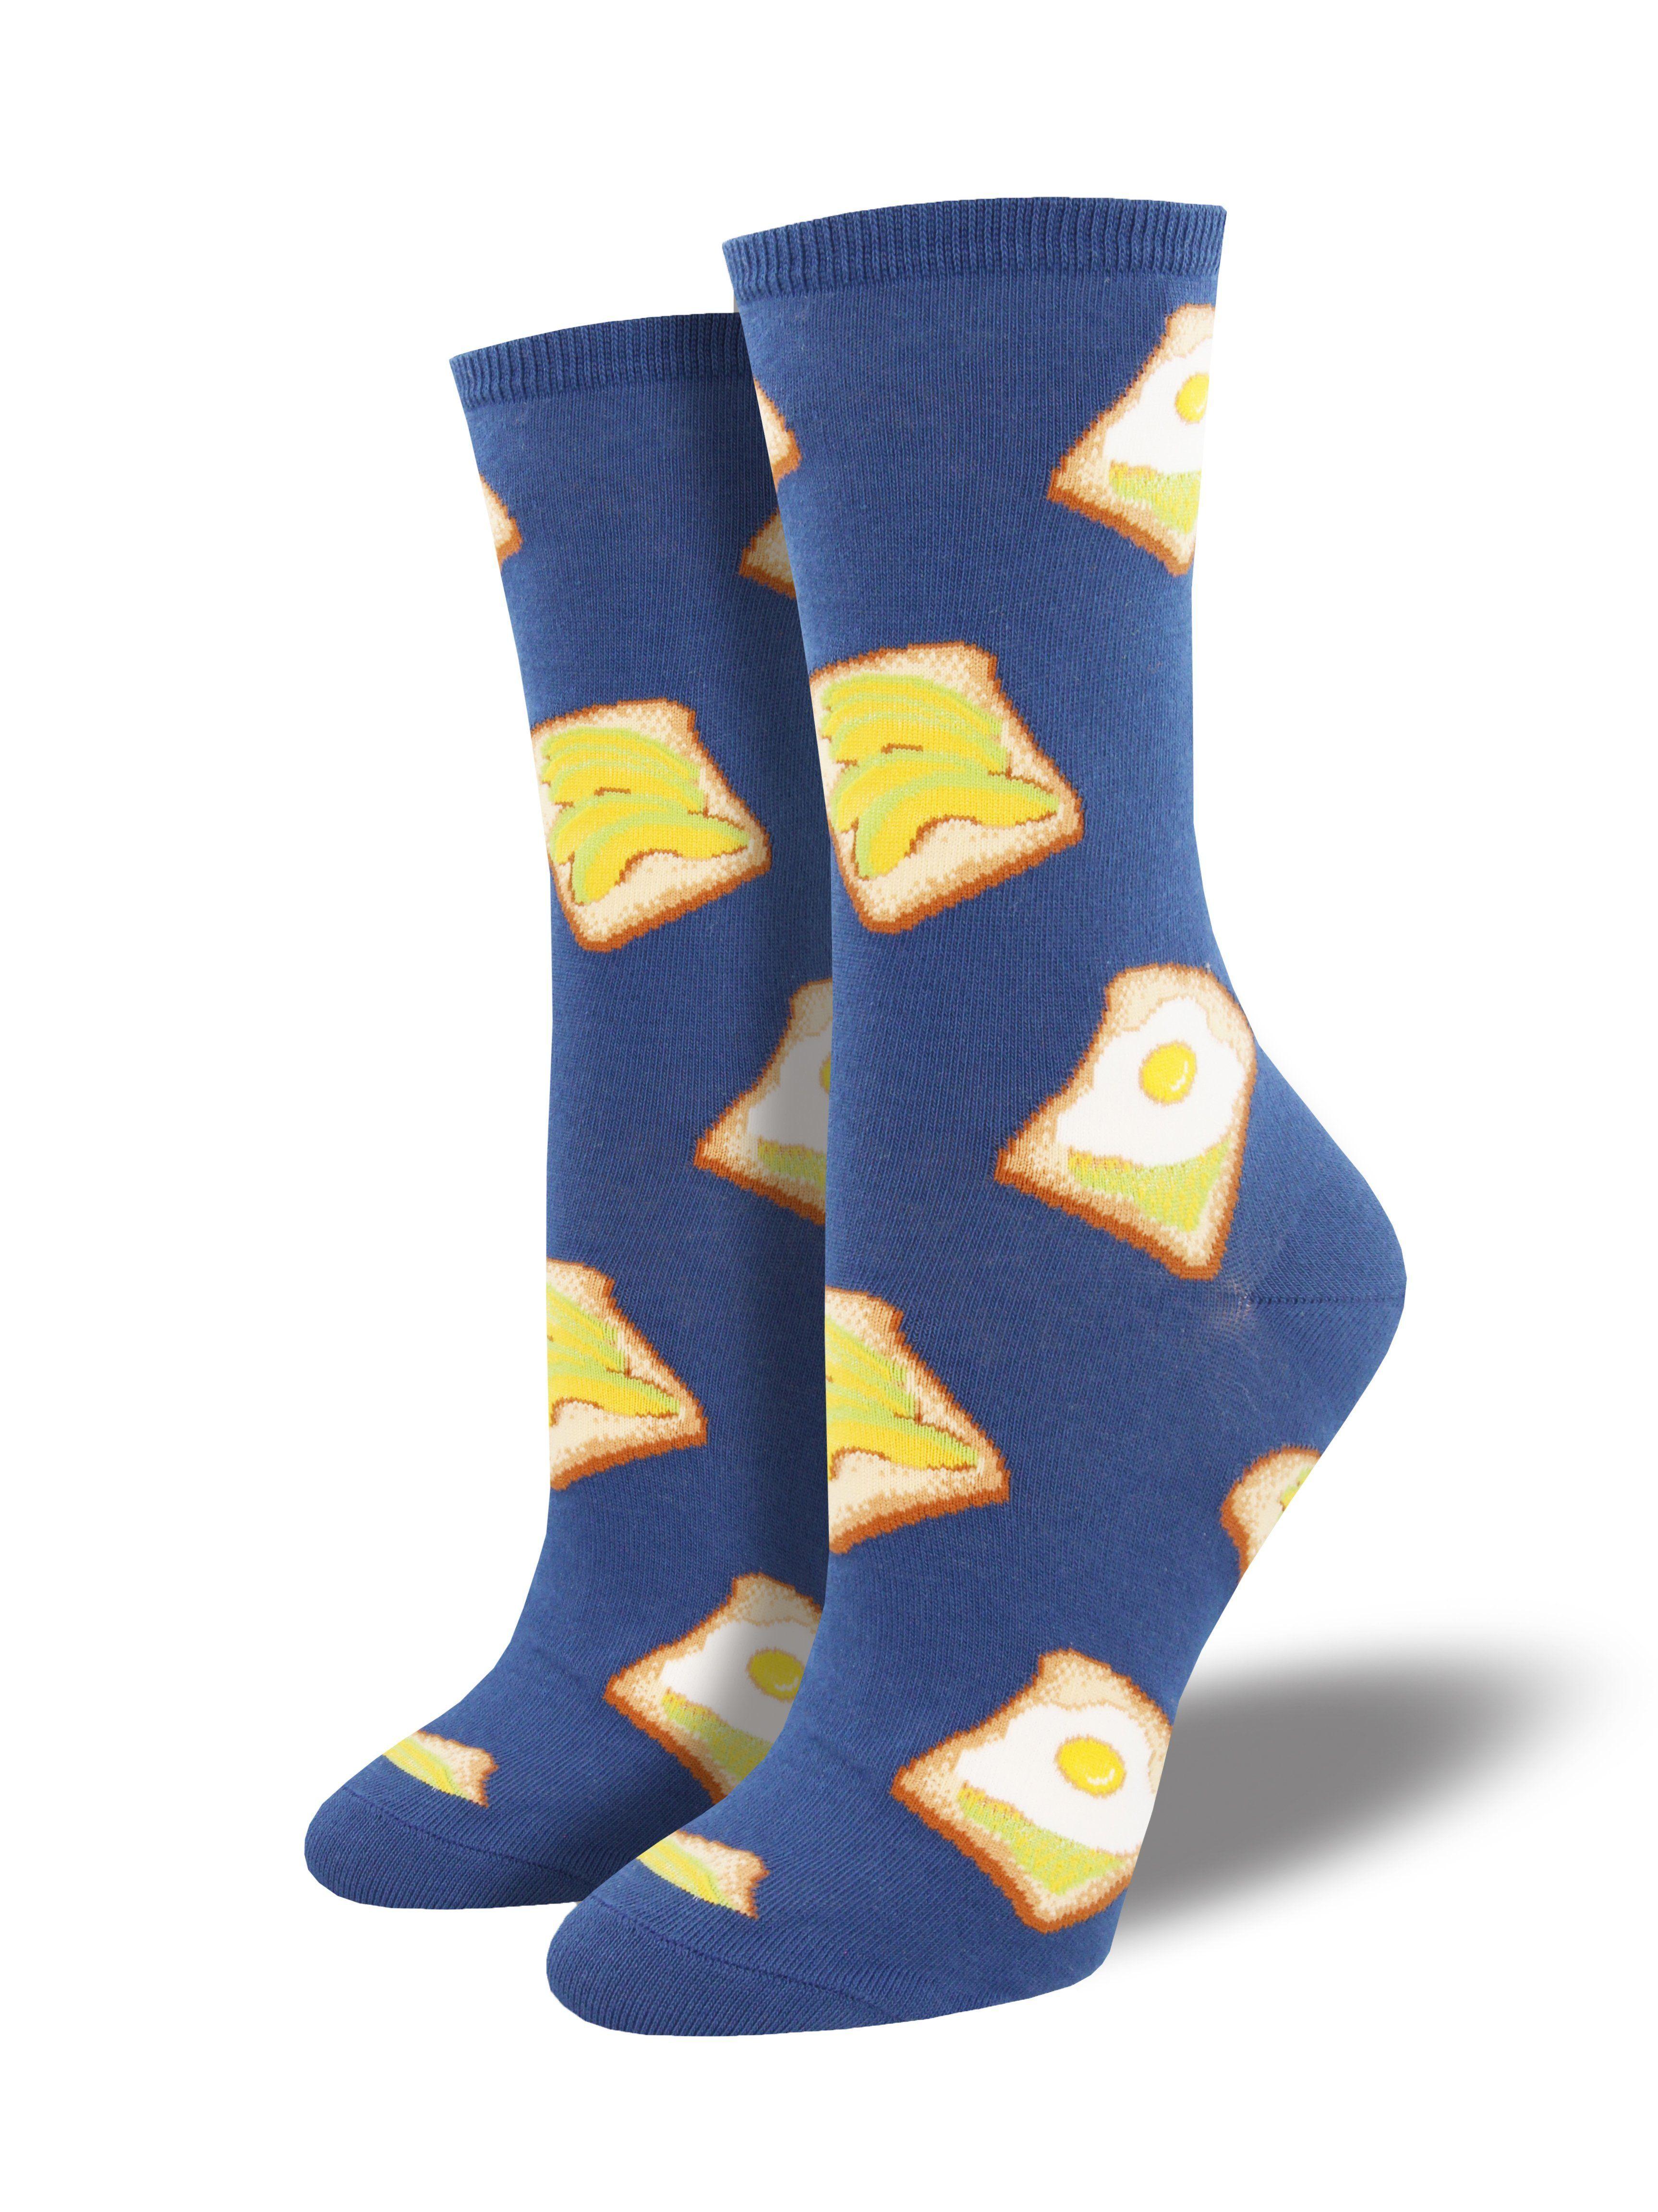 dd0fedd02 Avocado Toast Socks Food Socks, Guacamole, Avocado Toast, Crew Socks, Good  Food